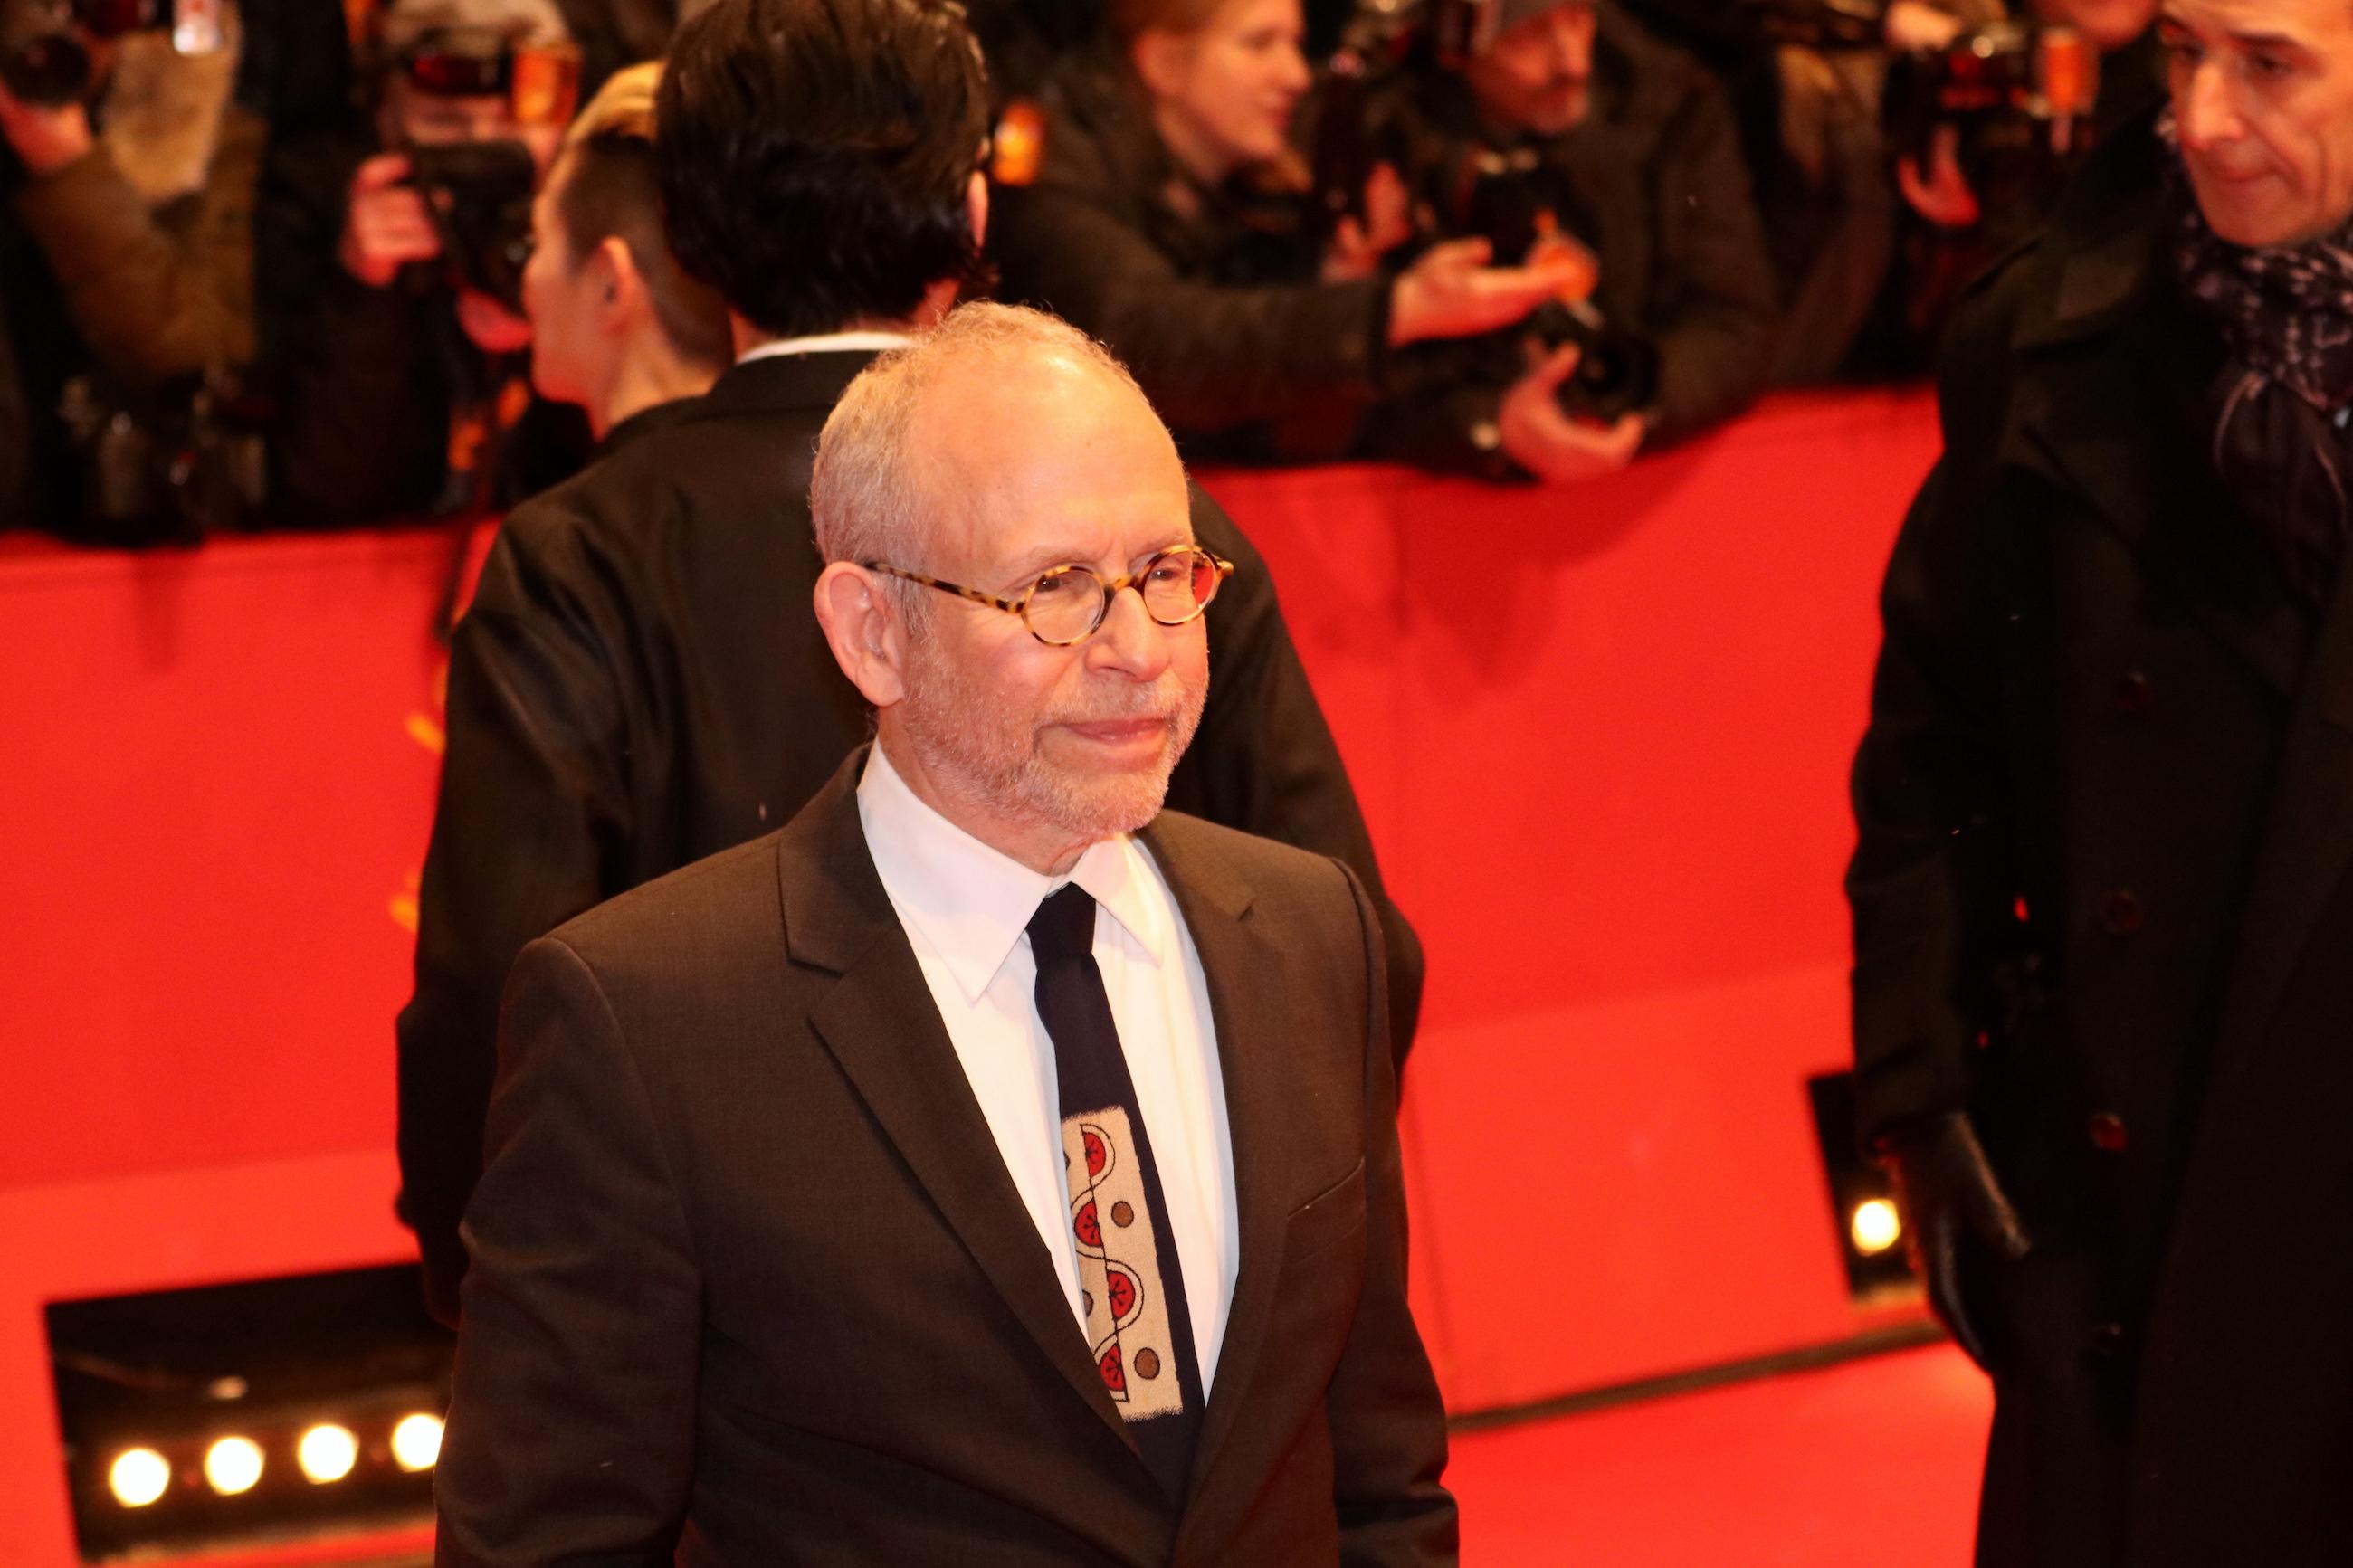 Berlino 2018: Bob Balaban sul red carpet di apertura